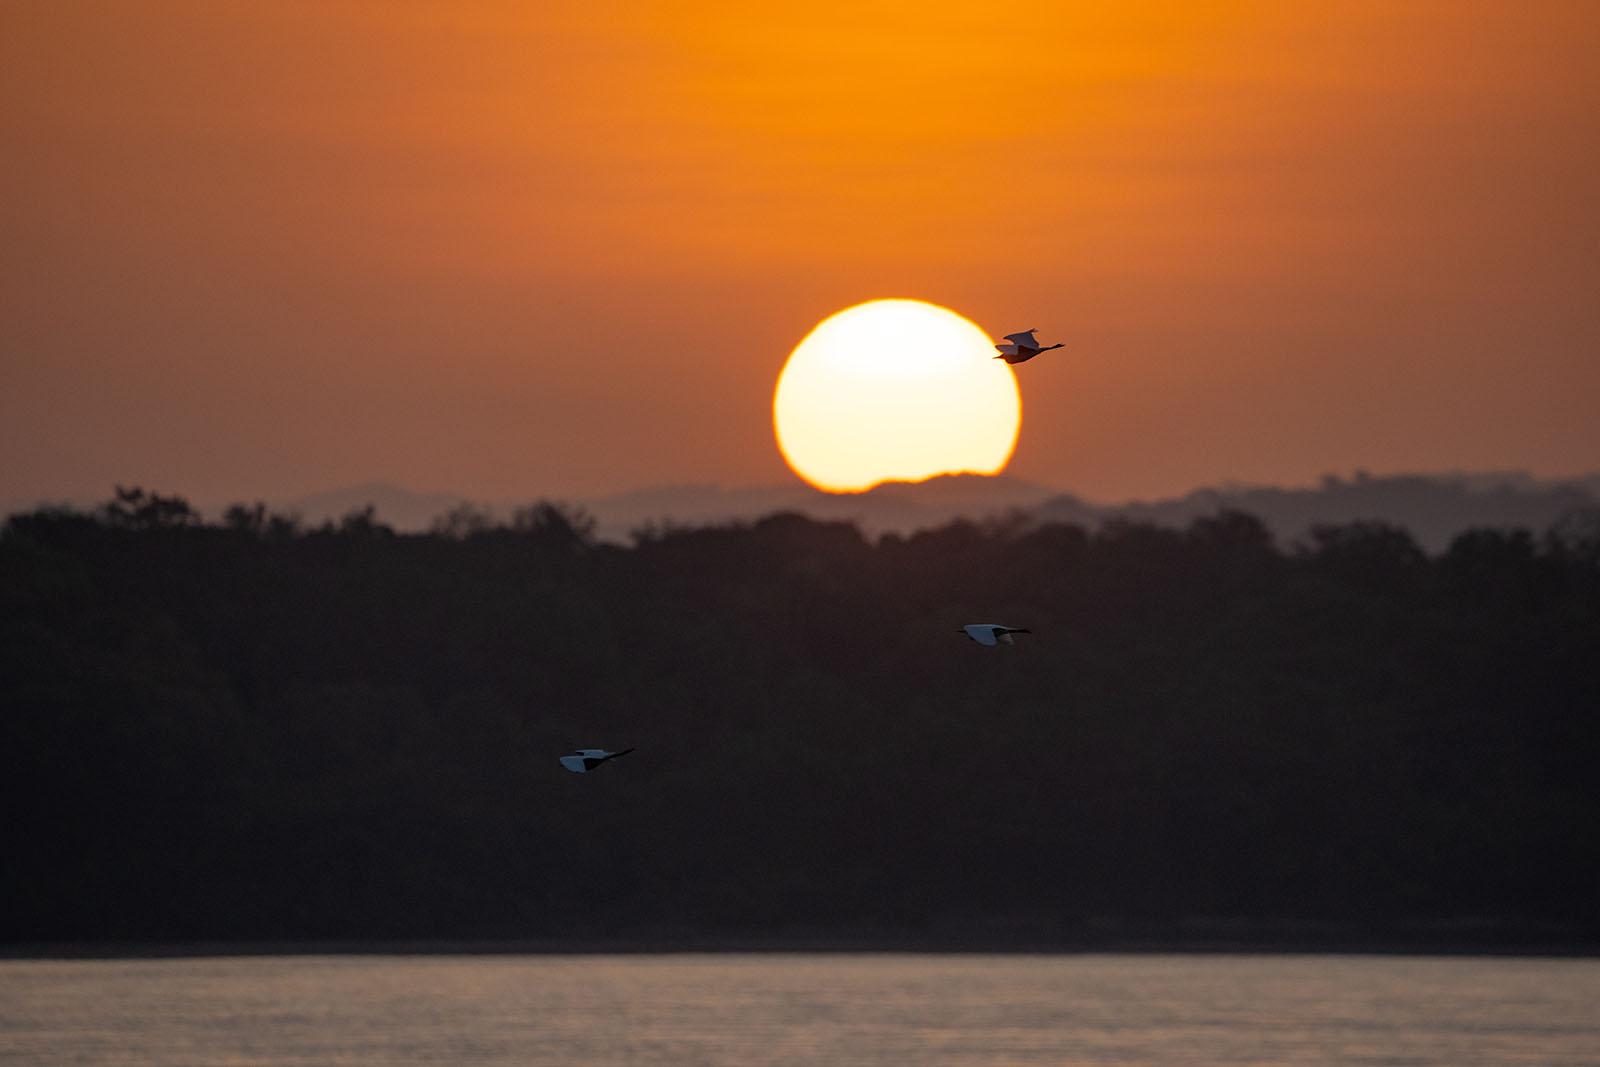 ave volando rio colombiano cavfish colombia